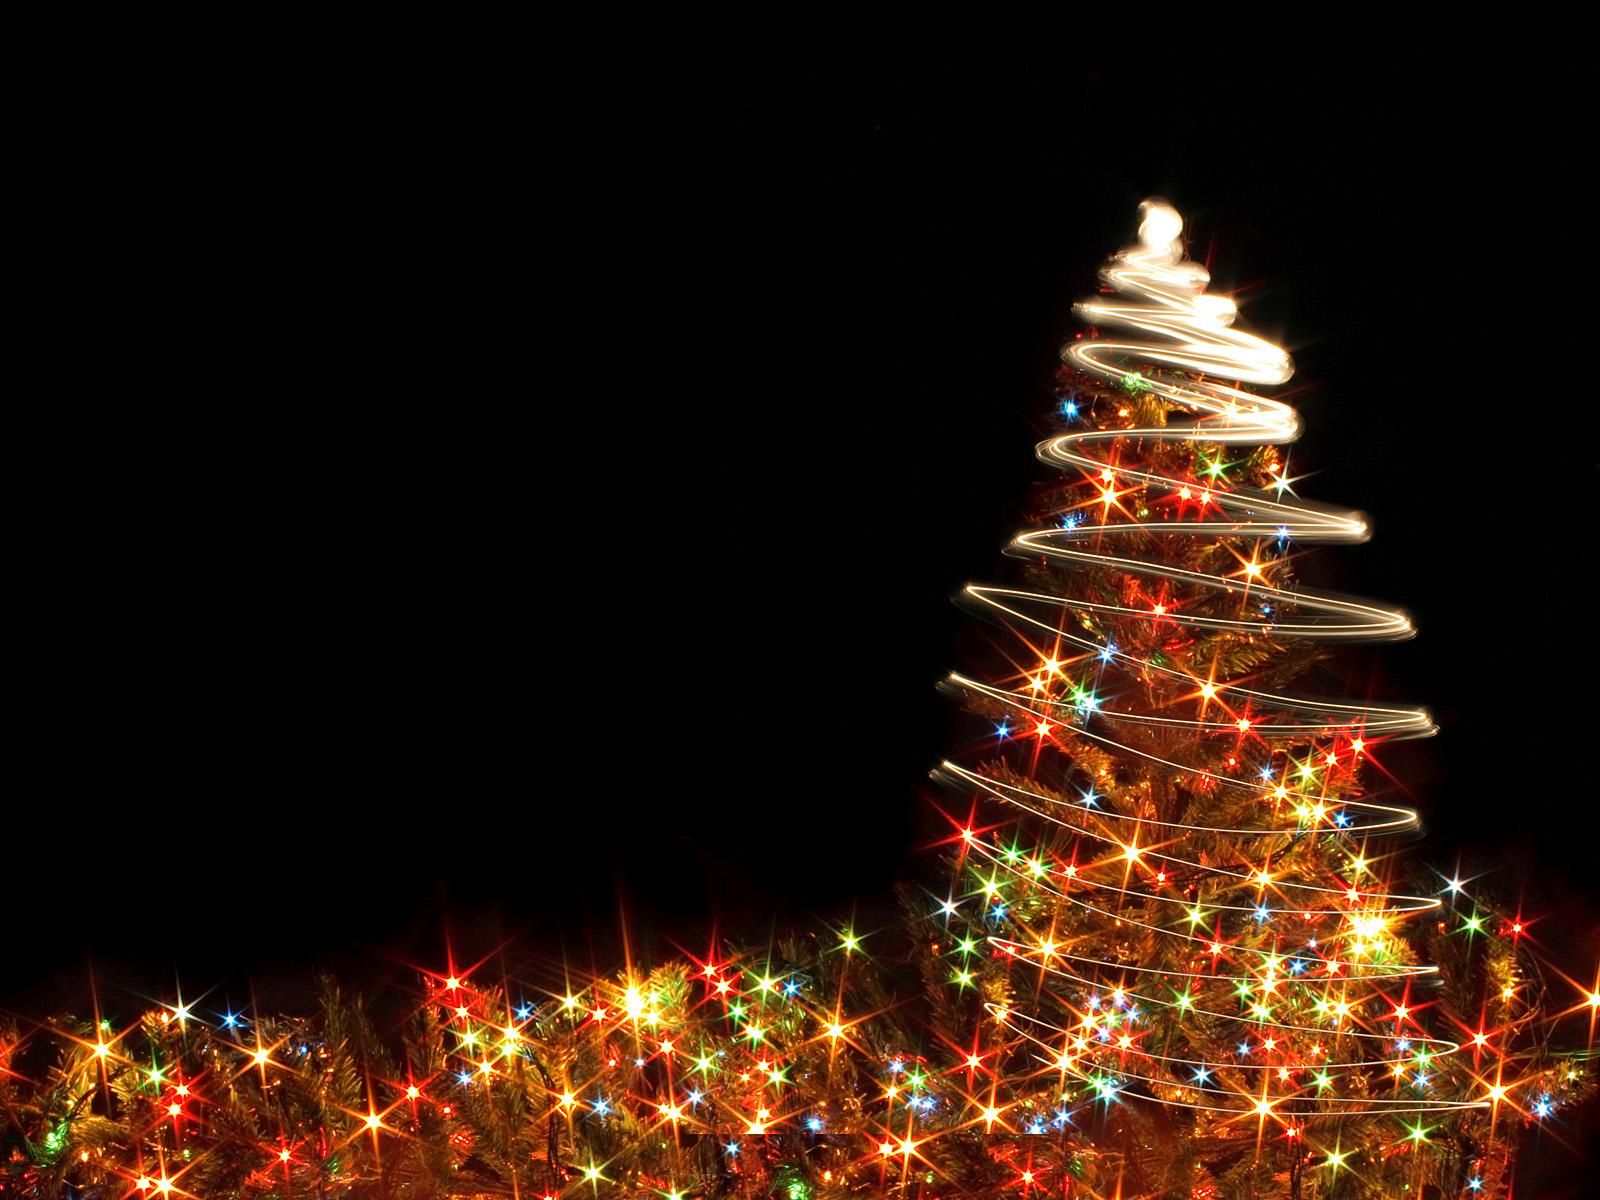 http://3.bp.blogspot.com/-CN_YmRKLmos/TsdOqndRkzI/AAAAAAAABos/b1FWR32qkY0/s1600/Christmas-lights-desktop-Wallpapers-HD-pao-images-15.jpg